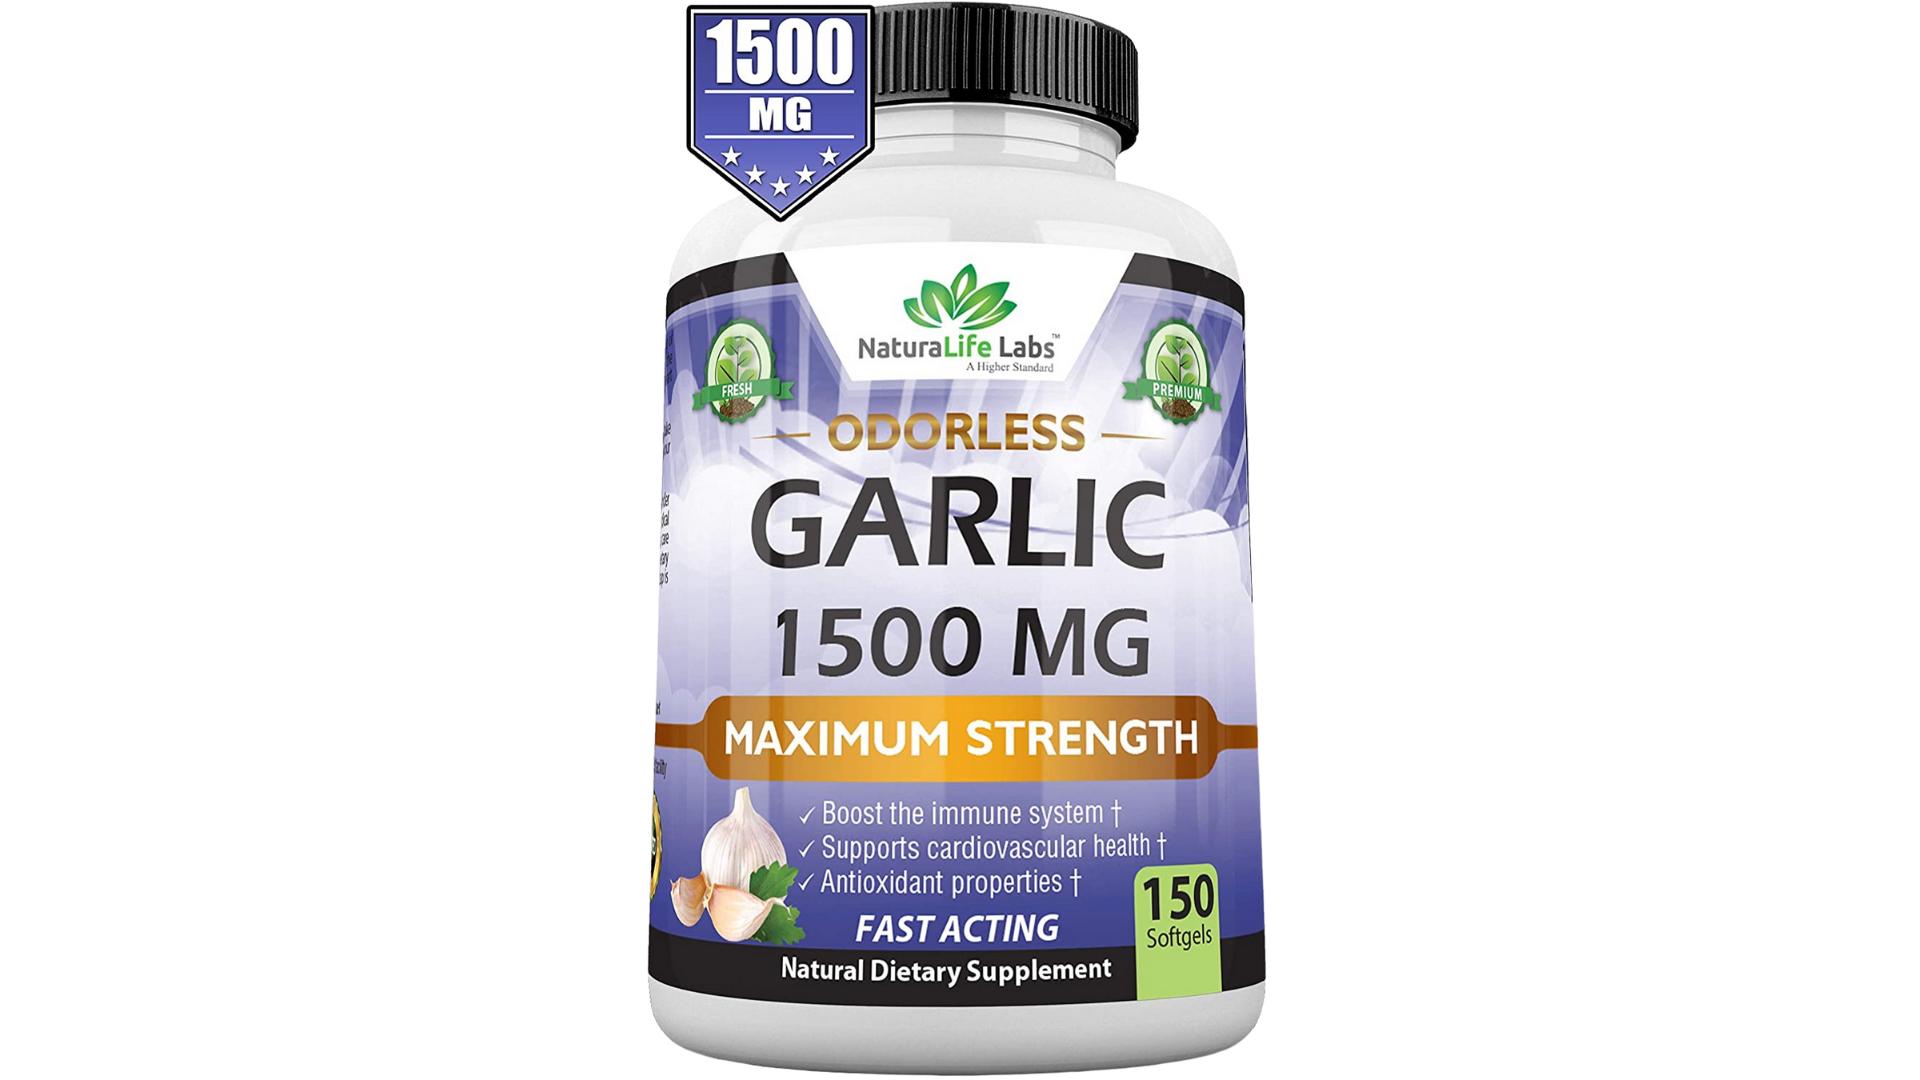 NatureLife Labs best garlic pills for high blood pressure